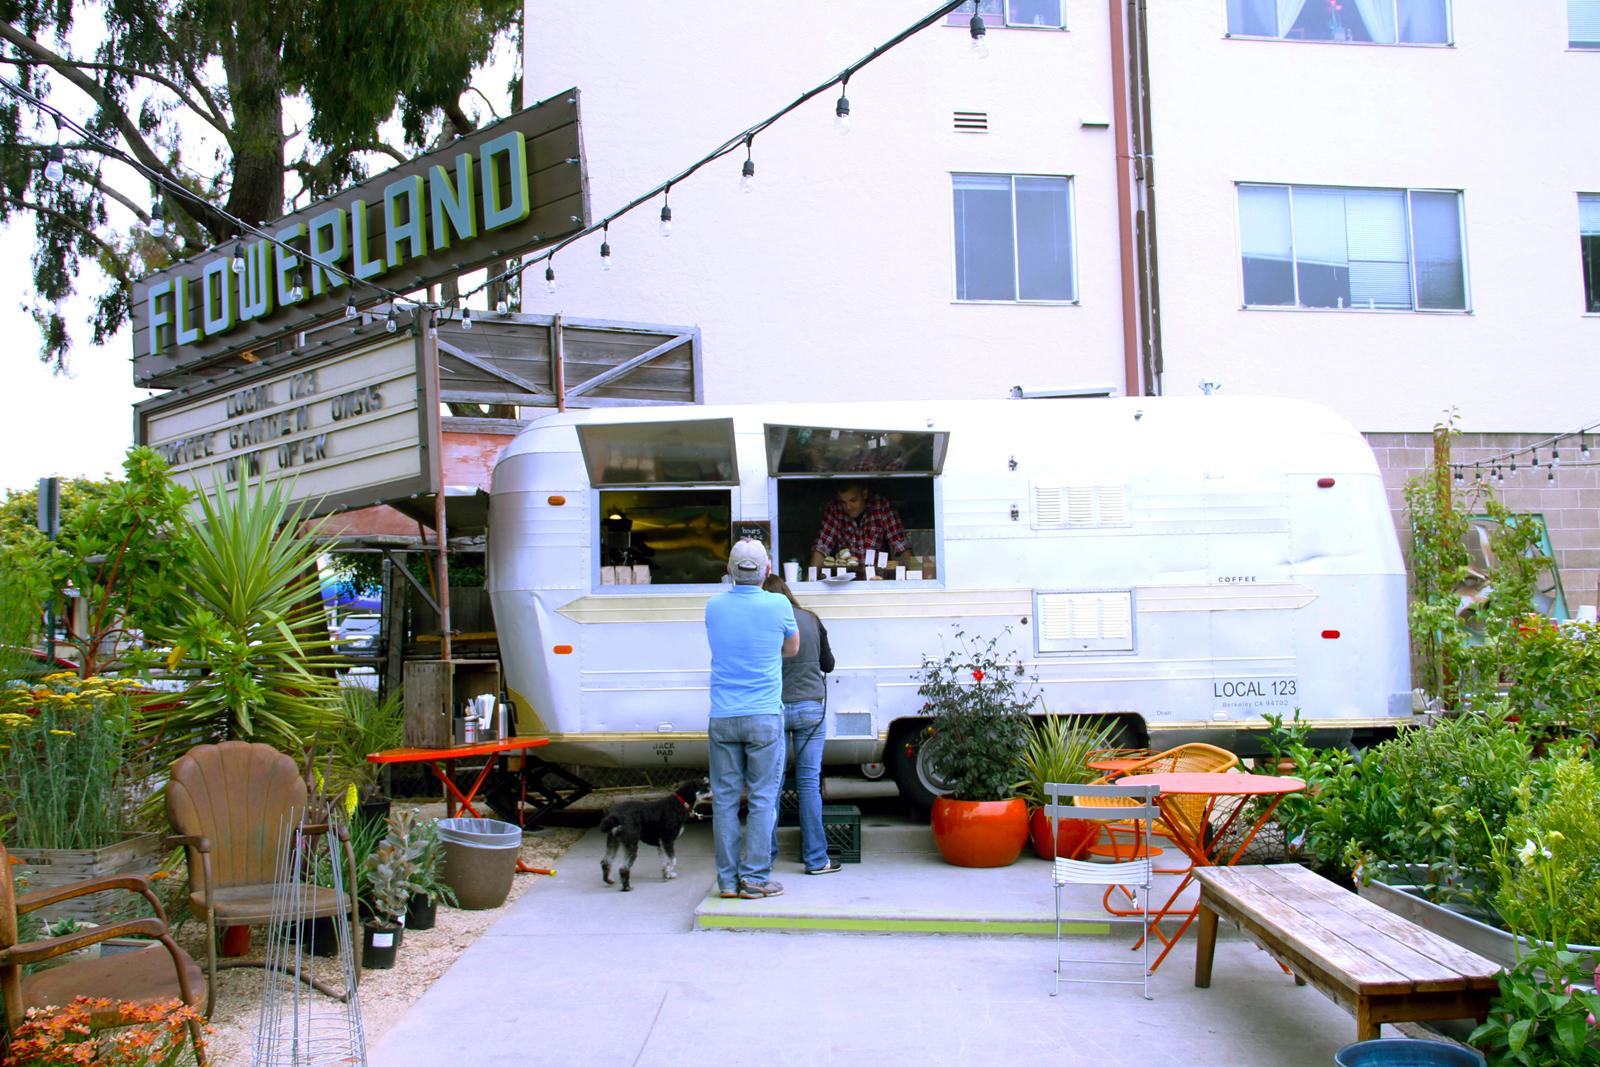 Local 123 and Flowerland in Berkeley, California